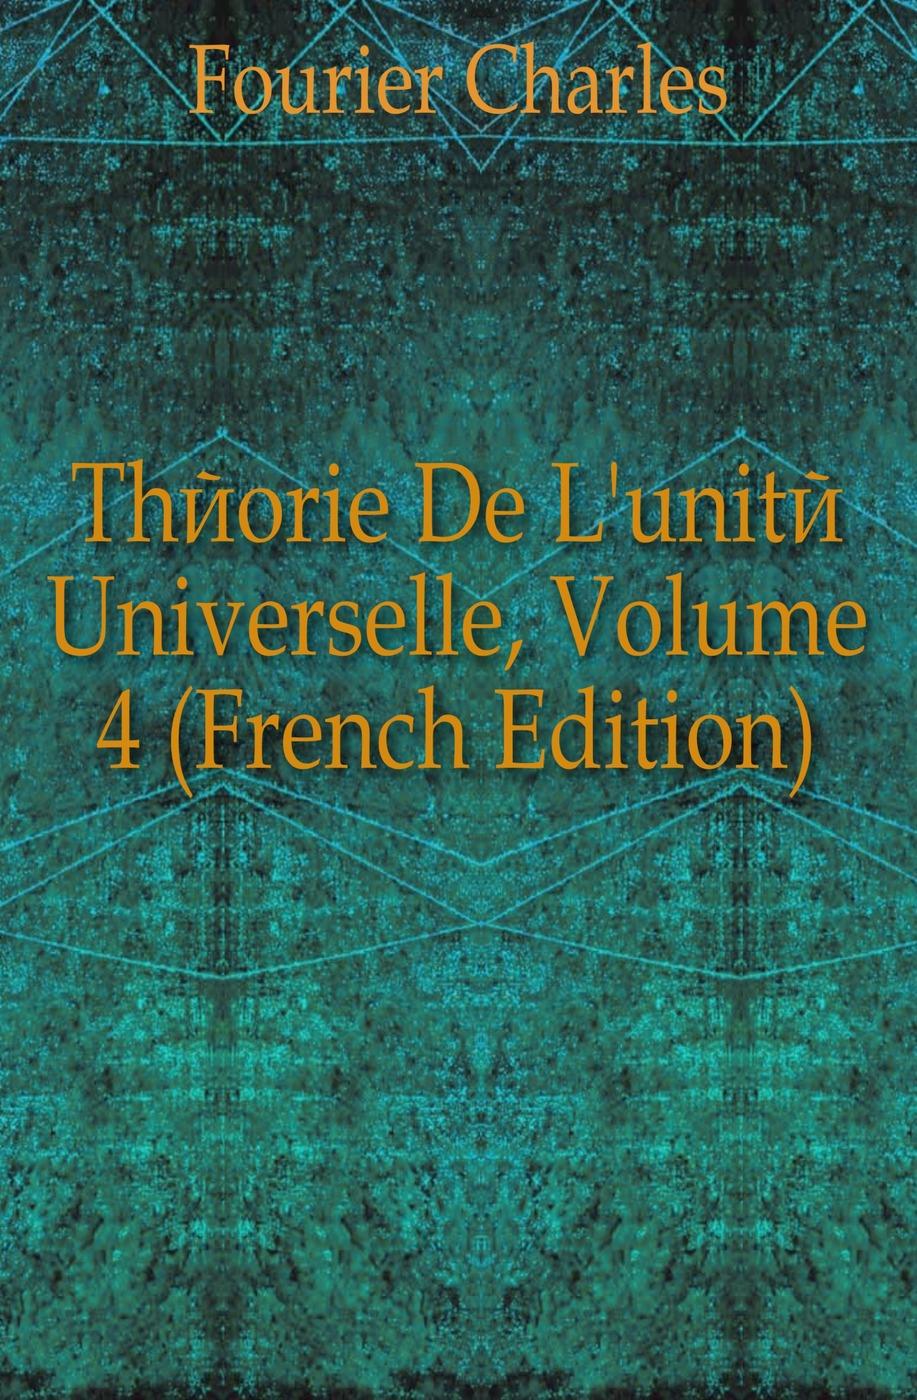 Fourier Charles Theorie De L'unite Universelle, Volume 4 (French Edition) fourier charles theorie de l association et de l unite universelle french edition